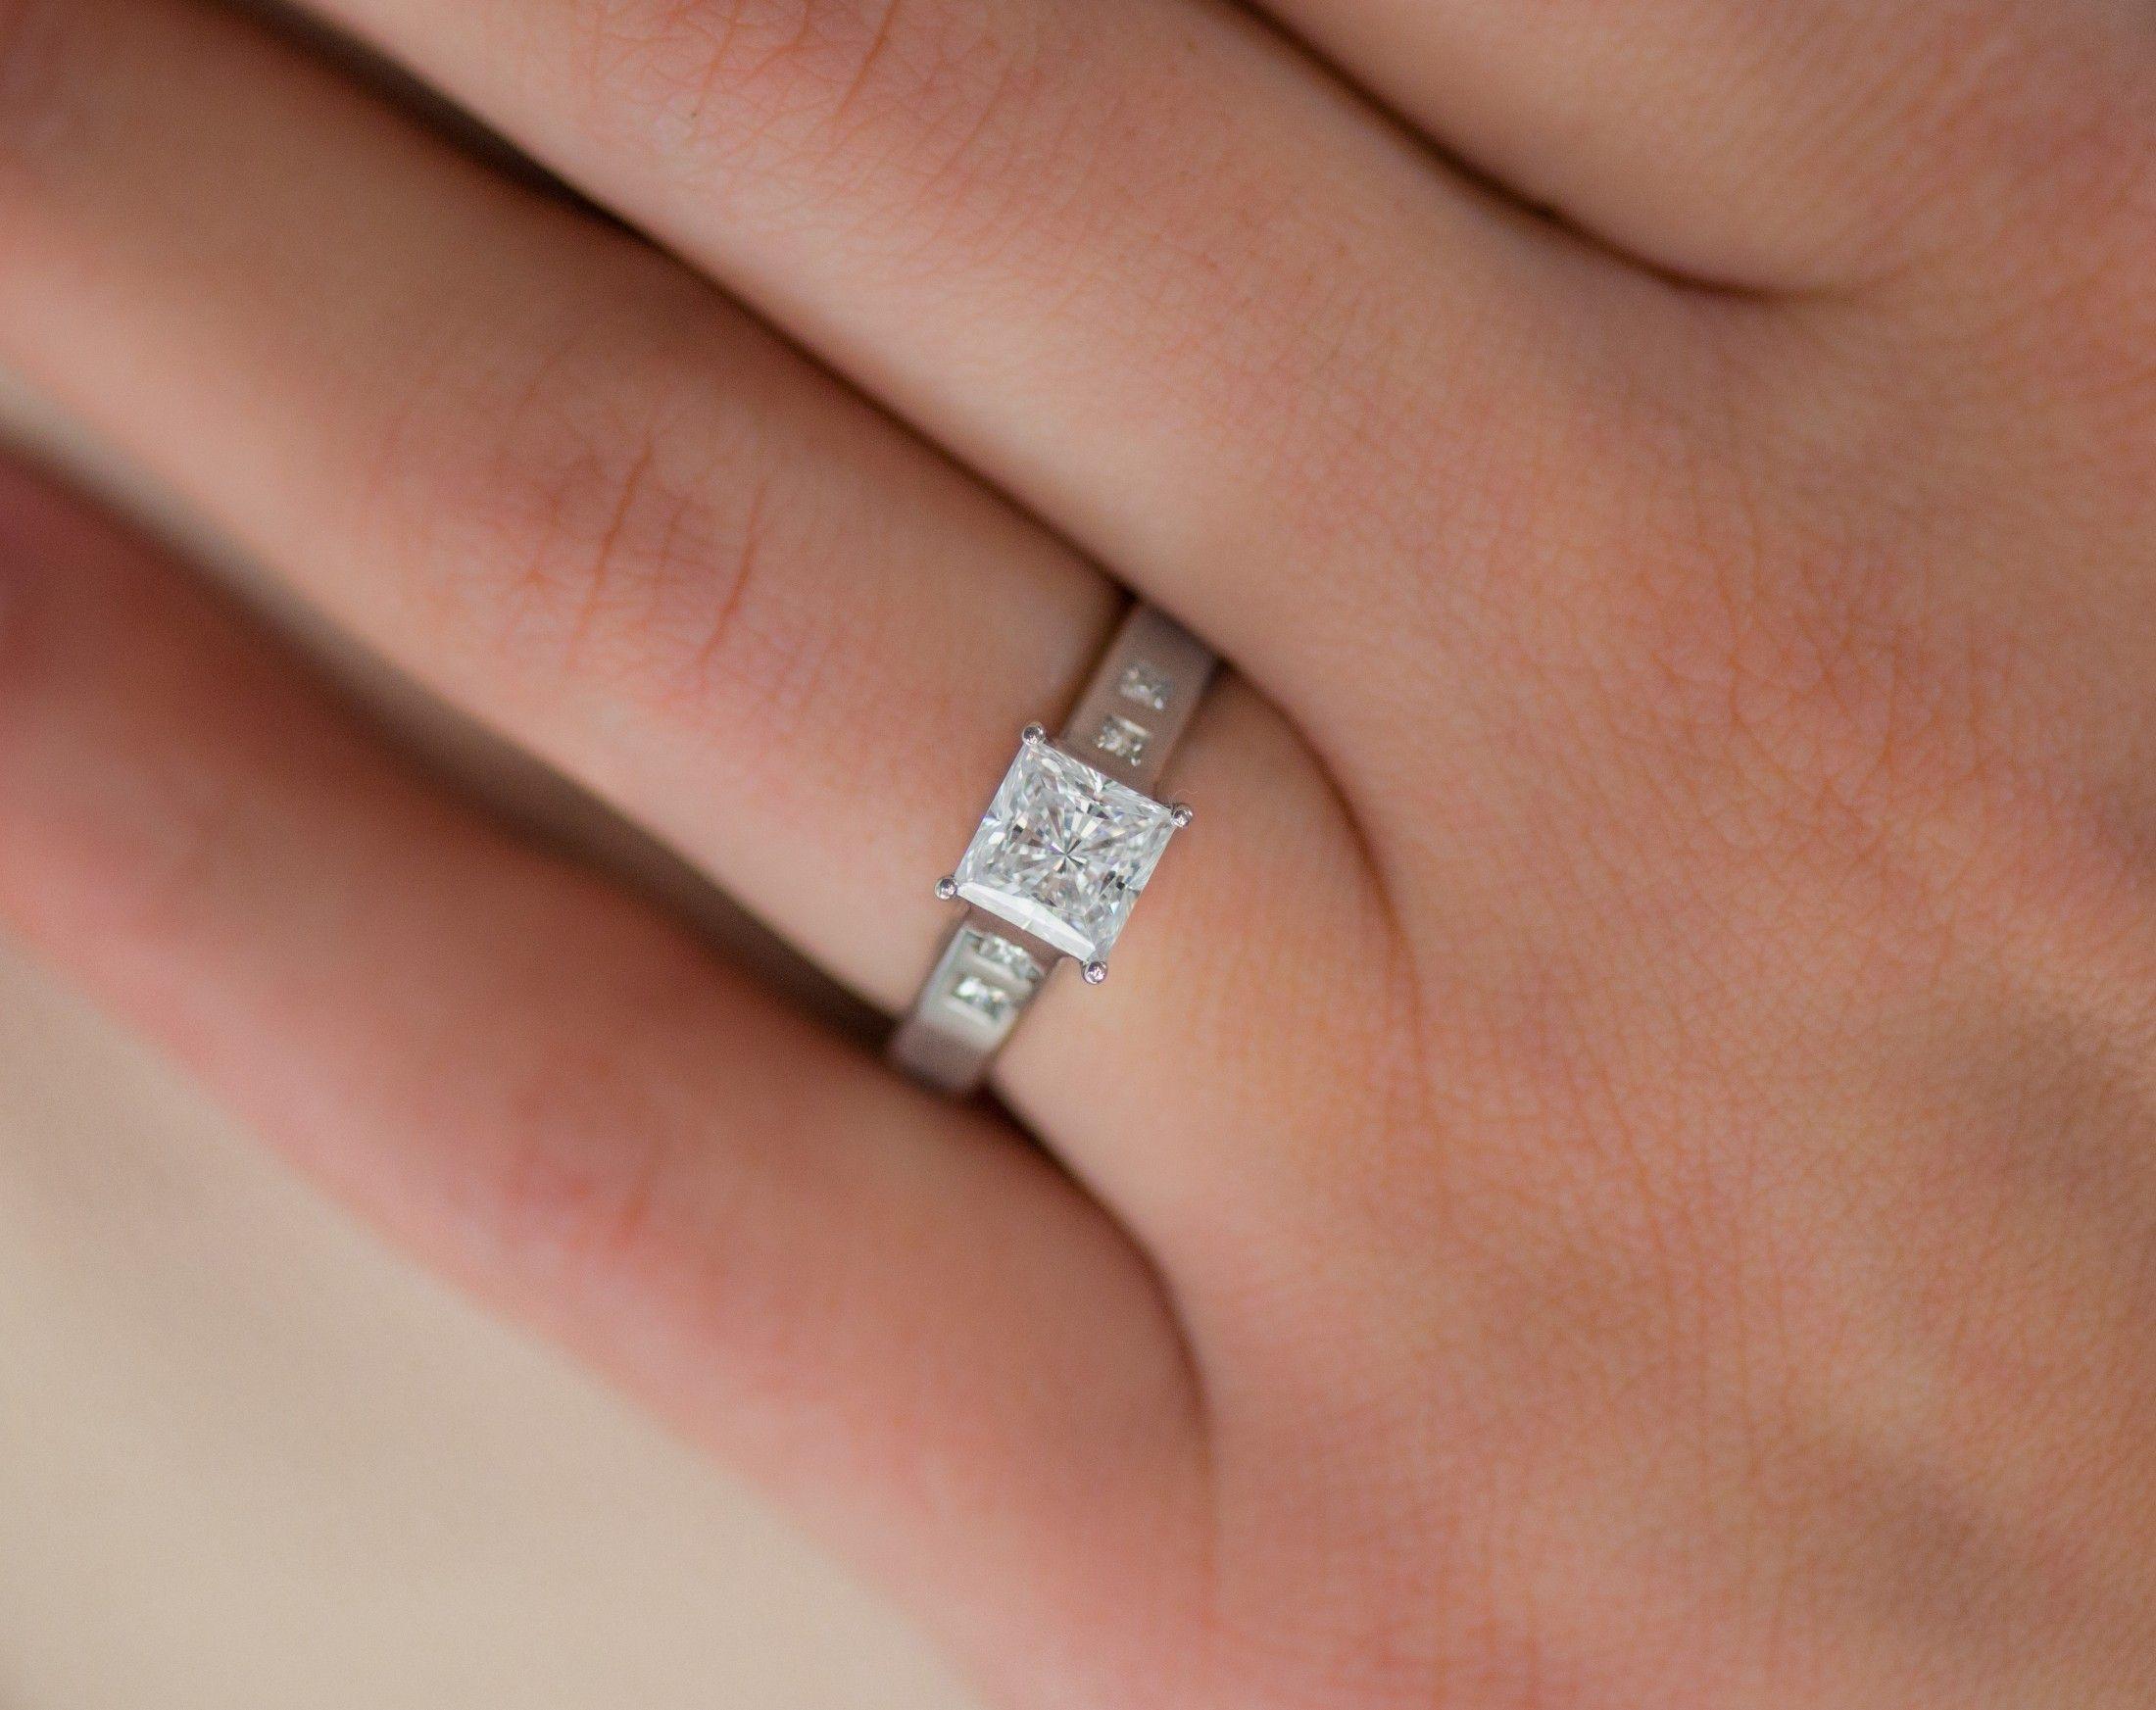 Cick ring